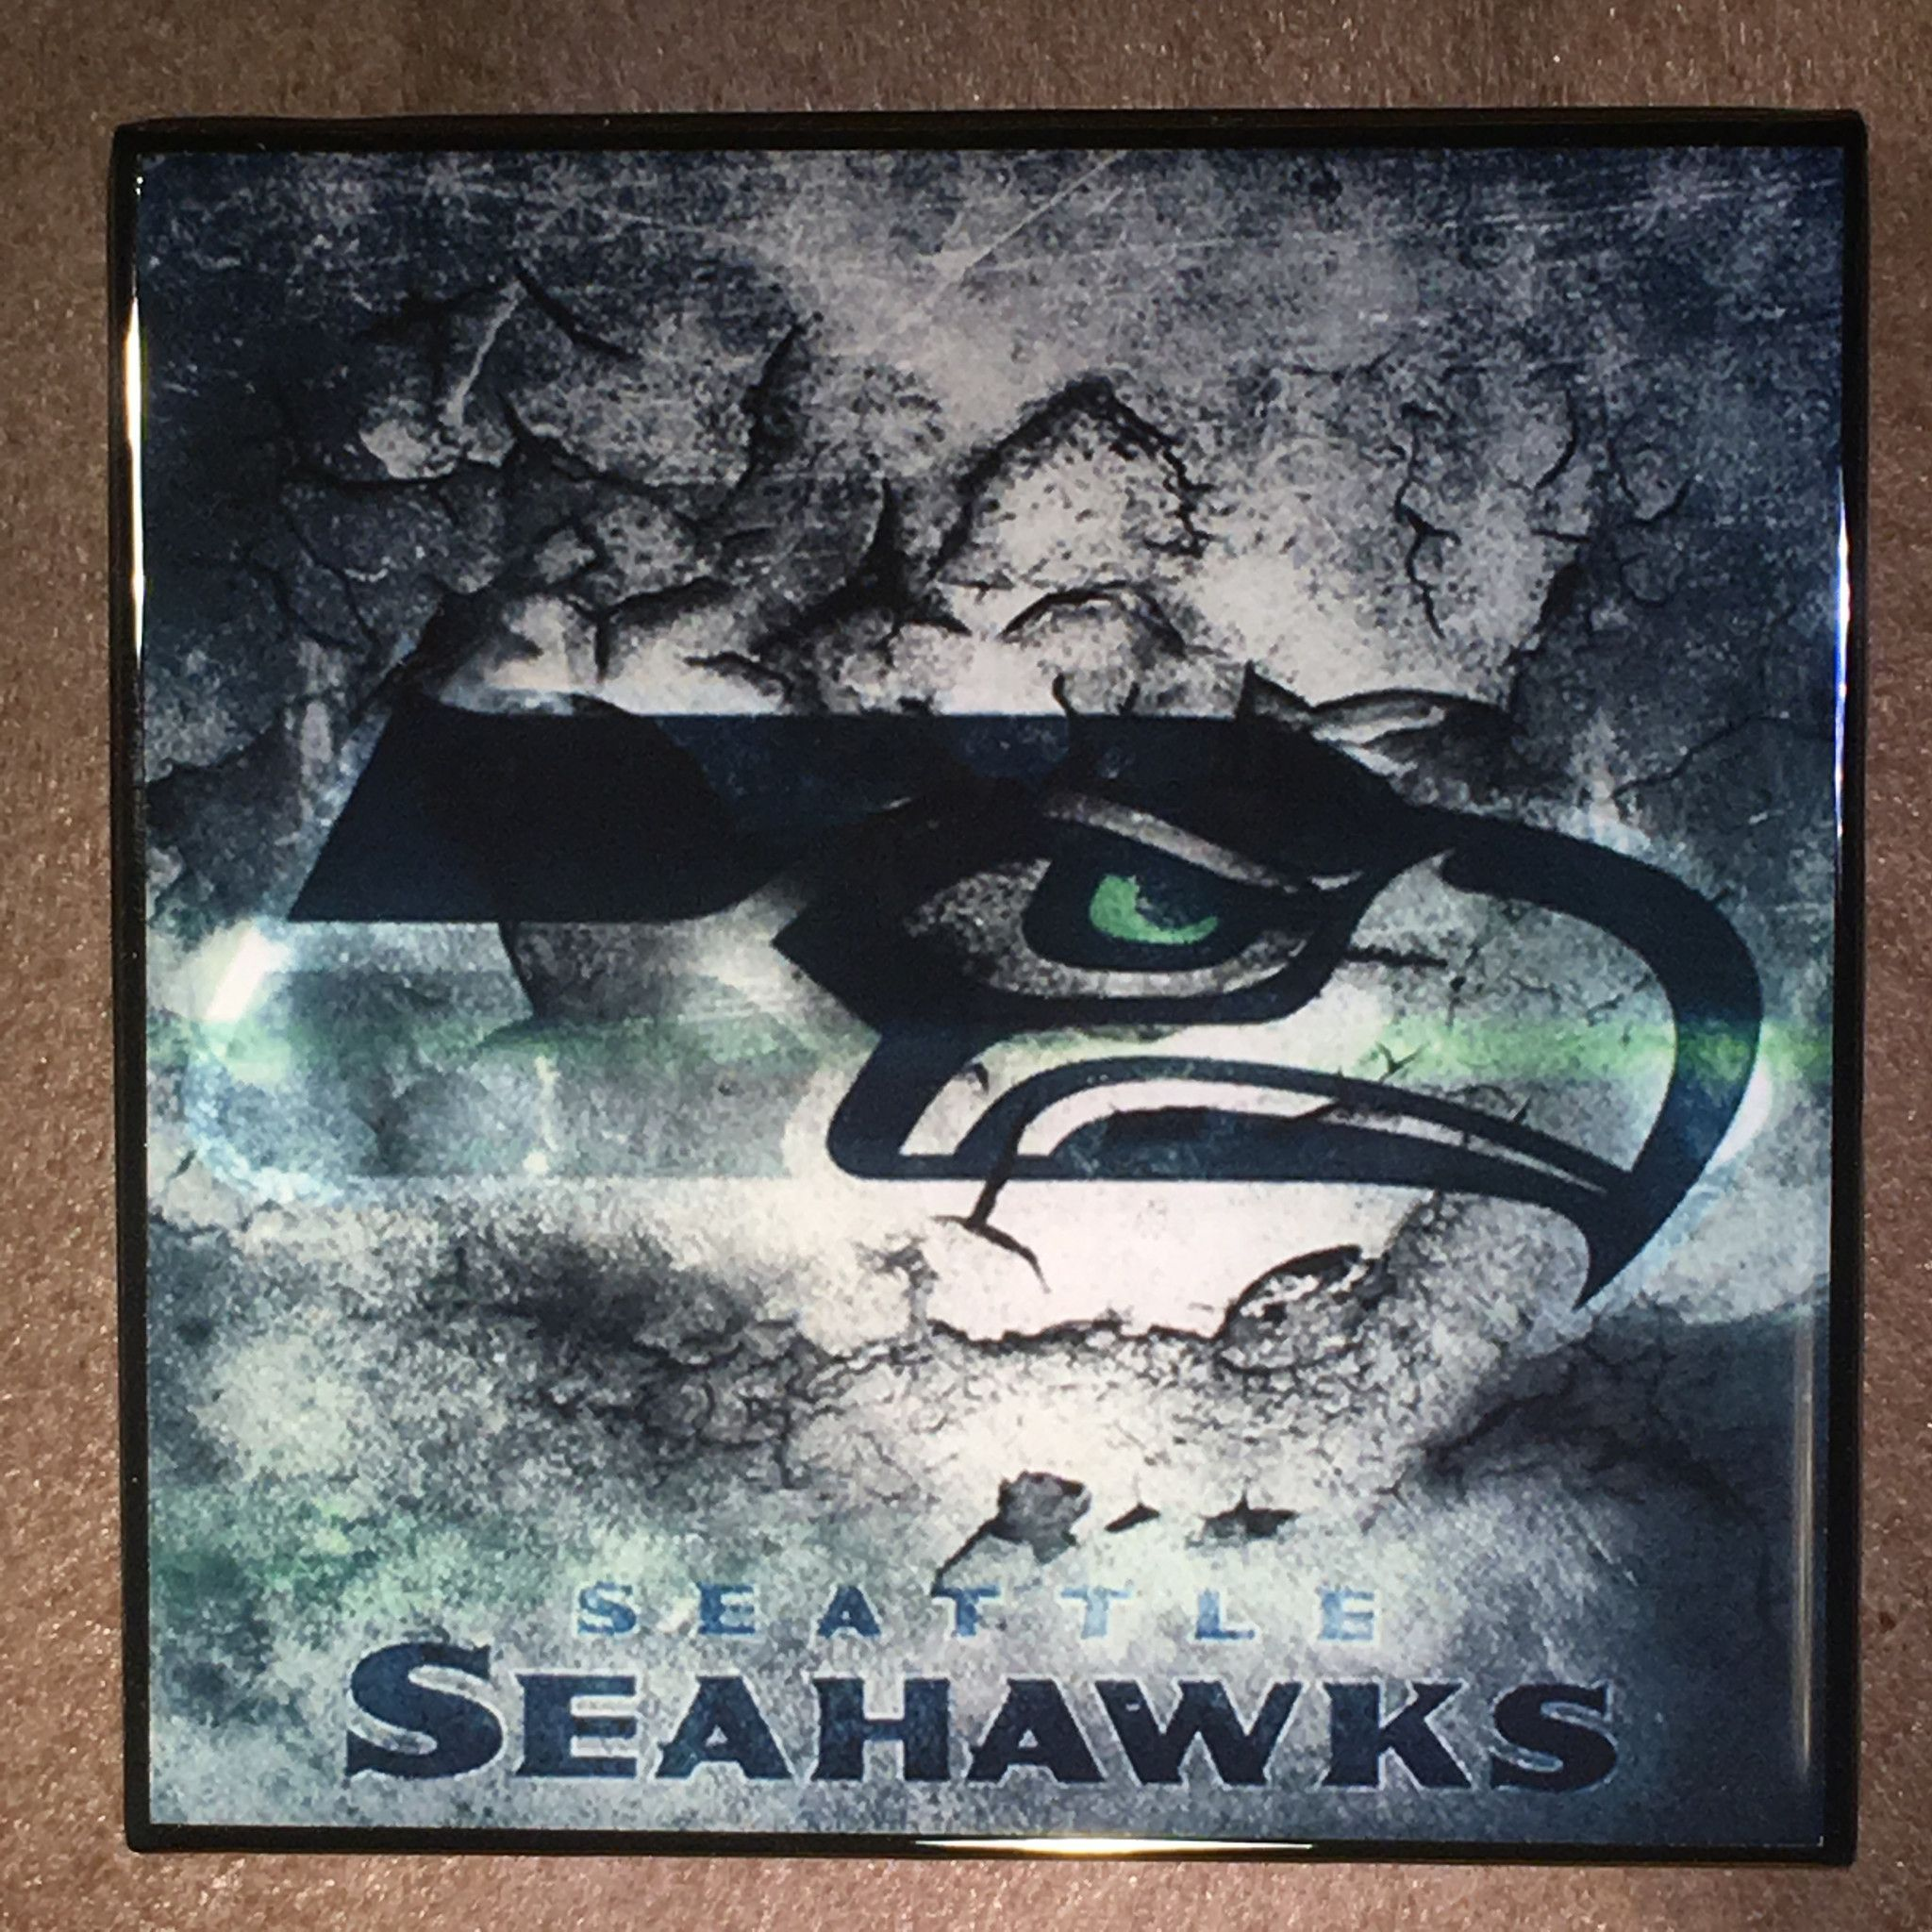 Seattle seahawks coaster nfl ceramic tile football coasters seattle seahawks coaster nfl ceramic tile football dailygadgetfo Gallery